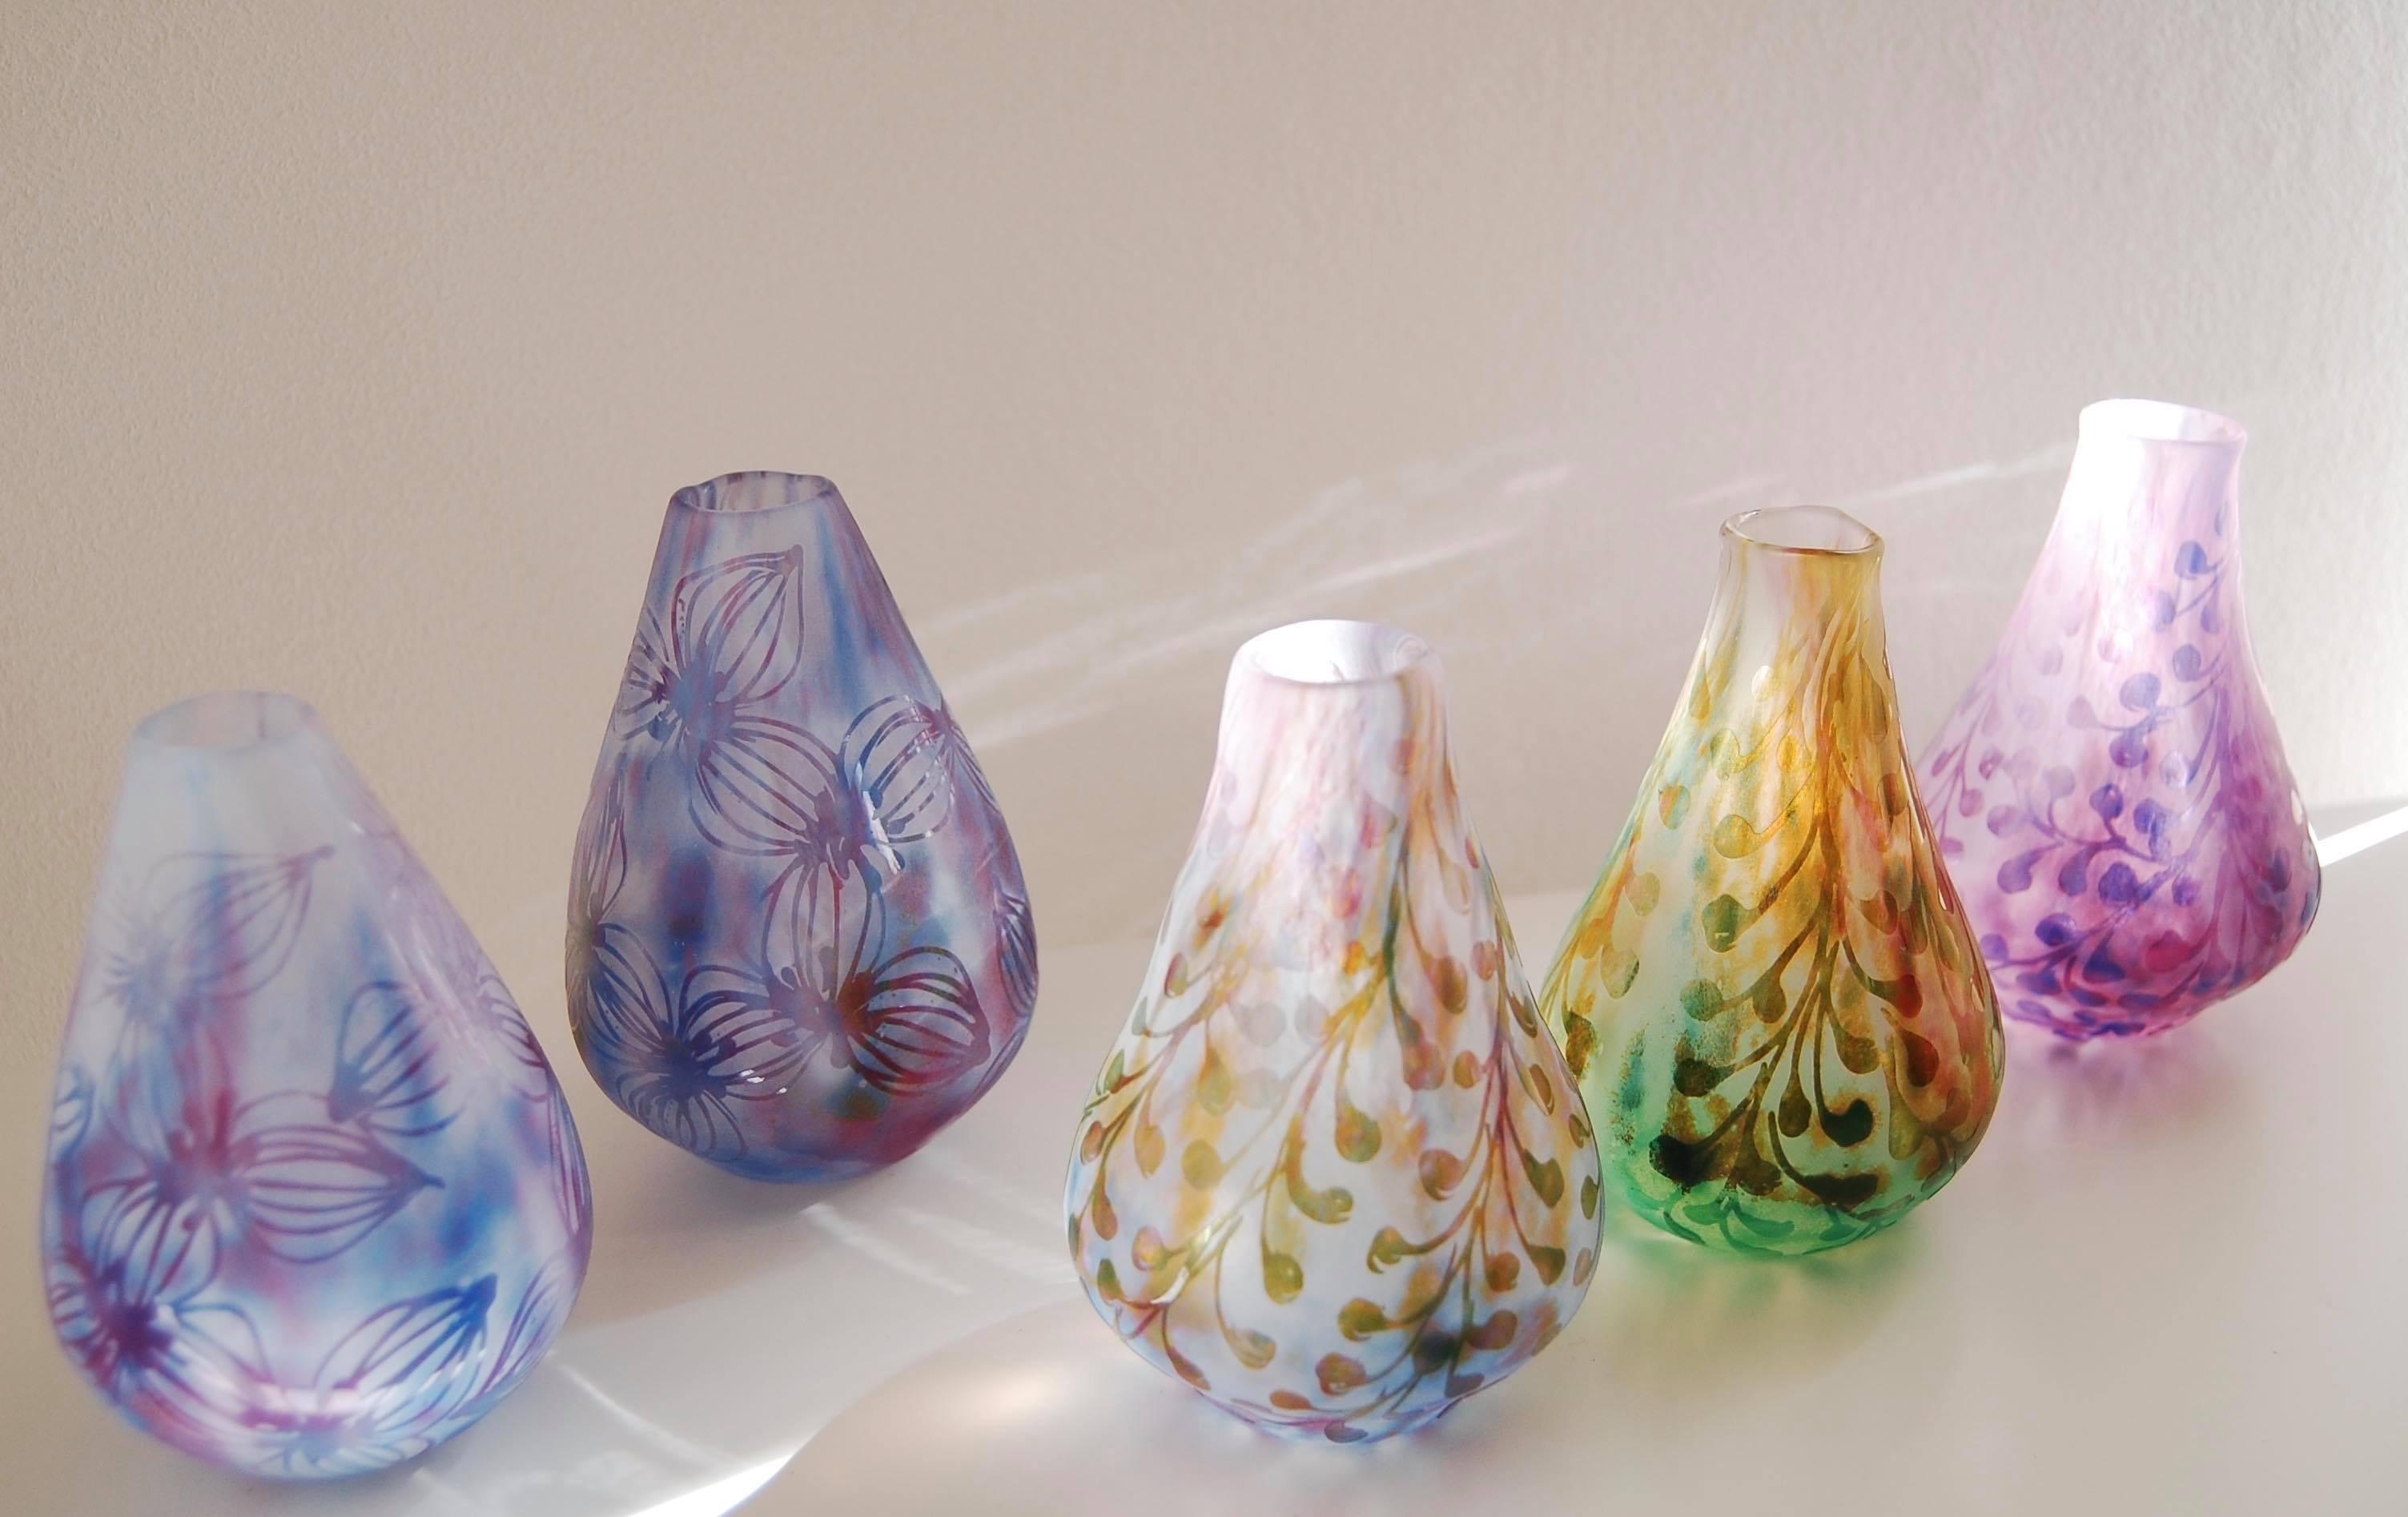 Bocciolo展 中野由紀子さんNostalgia花器・グラス_b0353974_15054159.jpg